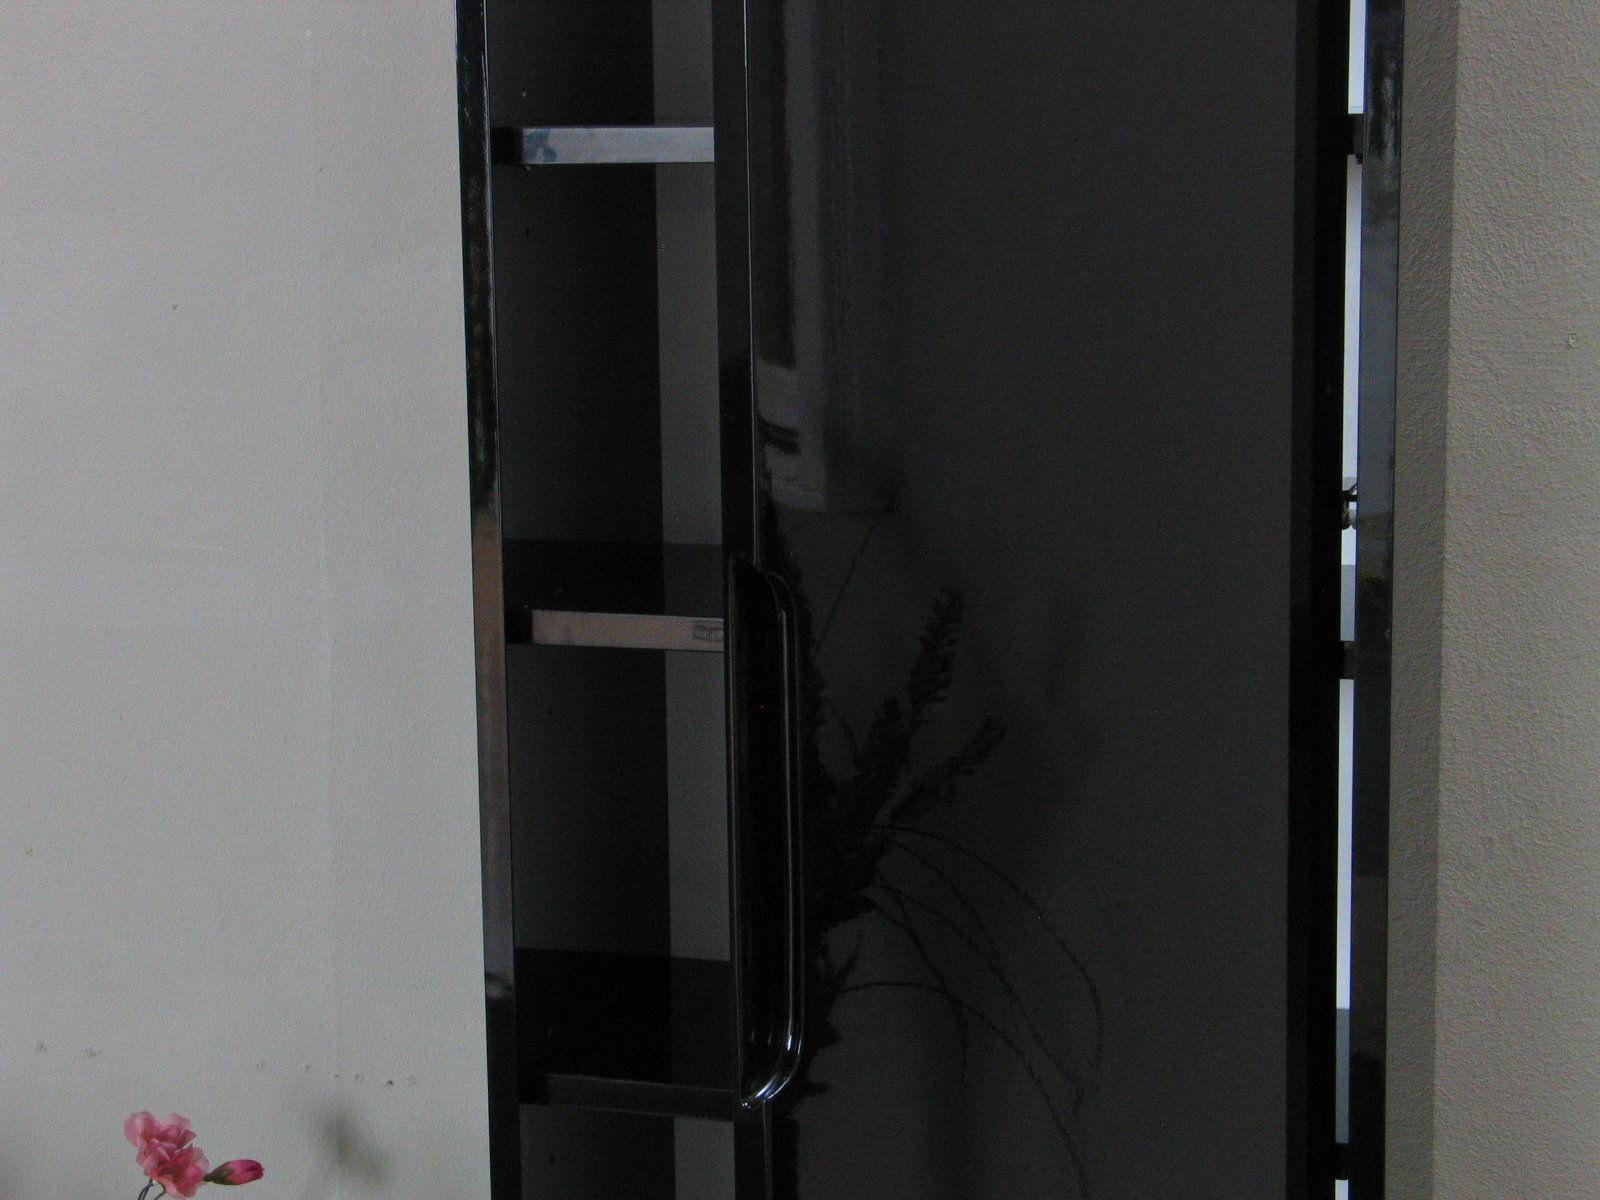 Wandschrank kitty hochglanz schwarz wandregal cd regal for Wandregal schwarz hochglanz